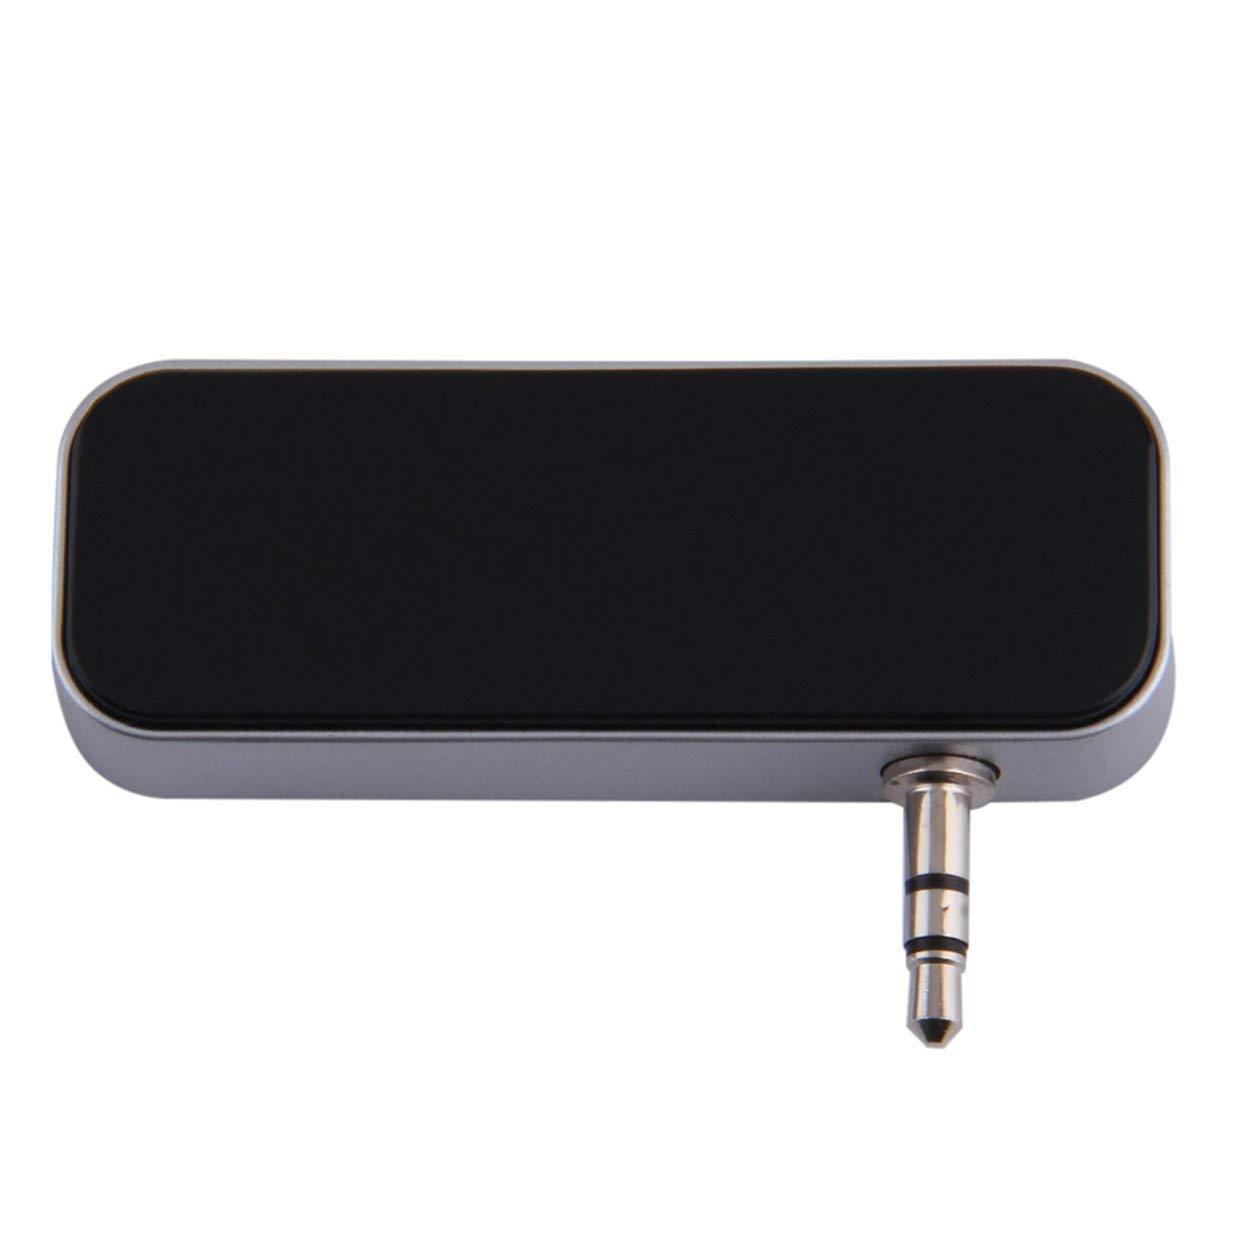 Tree-on-Life Kit de transmisor Mini FM para autom/óvil tama/ño de Bolsillo 3.5FM de m/úsica con Cable USB para tel/éfonos m/óviles Kit de Coche con Pantalla LCD para iPhone